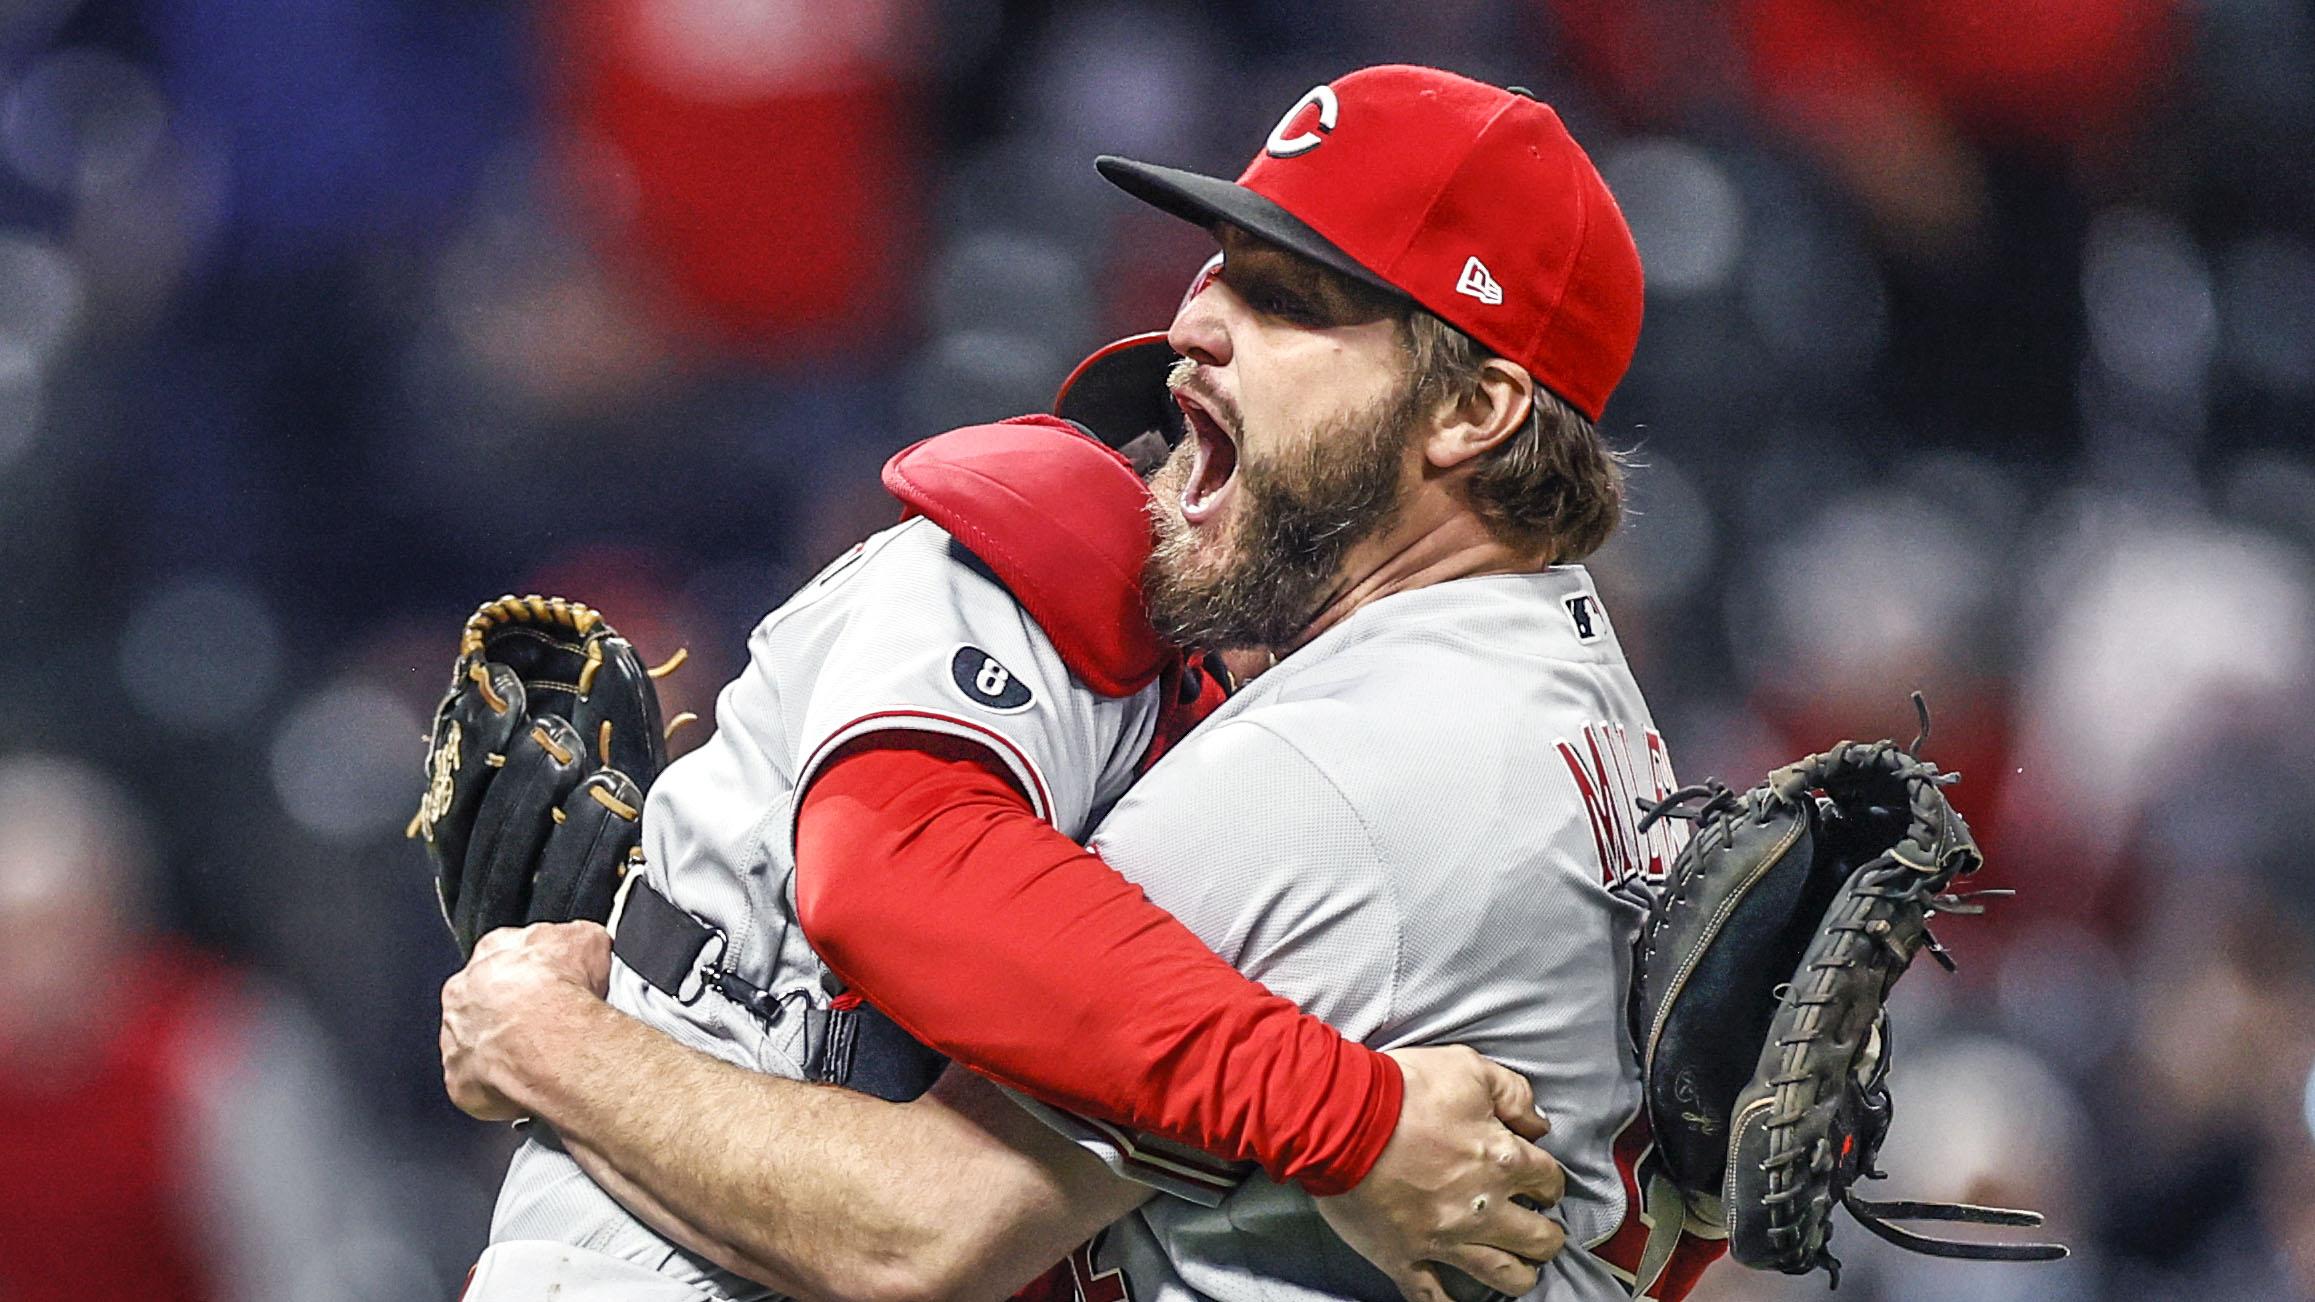 Cincinnati Reds veteran Wade Miley tosses season's fourth no-hitter